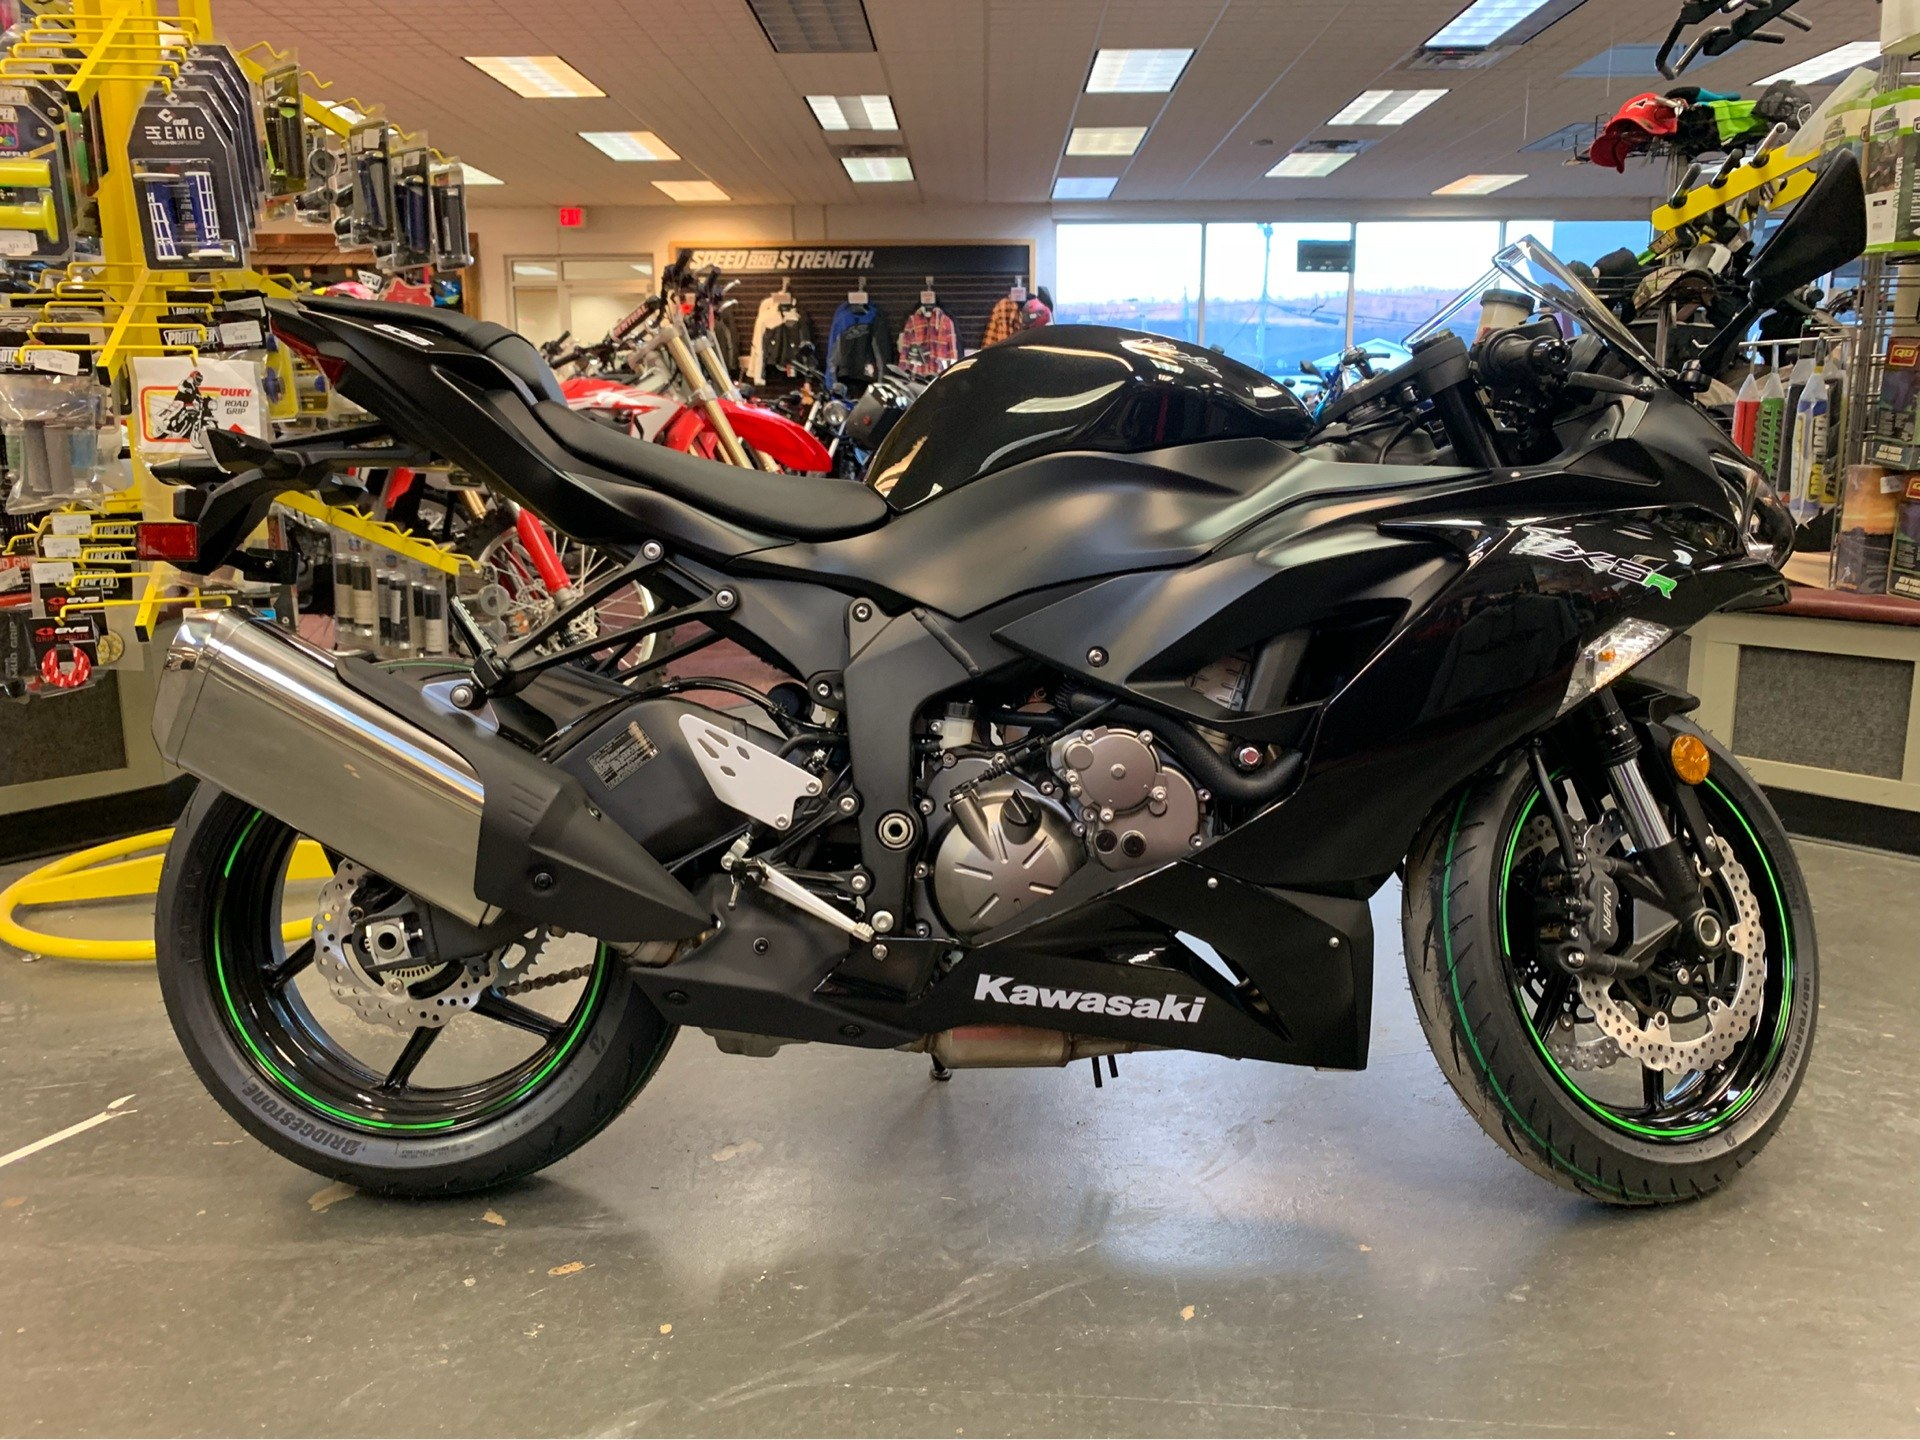 2019 Kawasaki Ninja Zx 6r Motorcycles Petersburg West Virginia